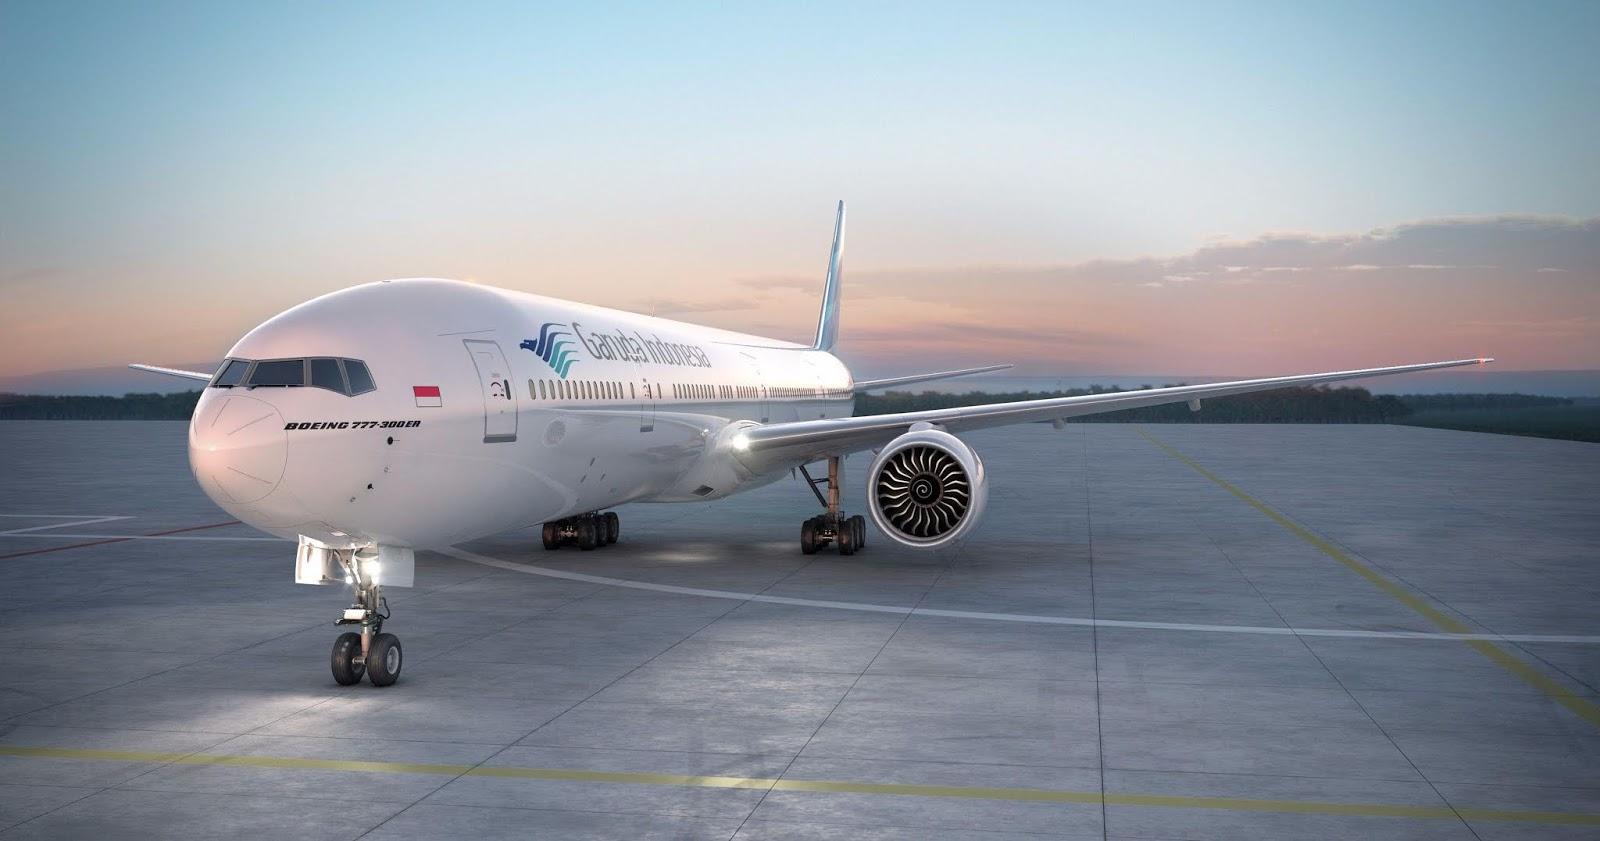 Garuda Indonesia Boeing 777 wallpapers